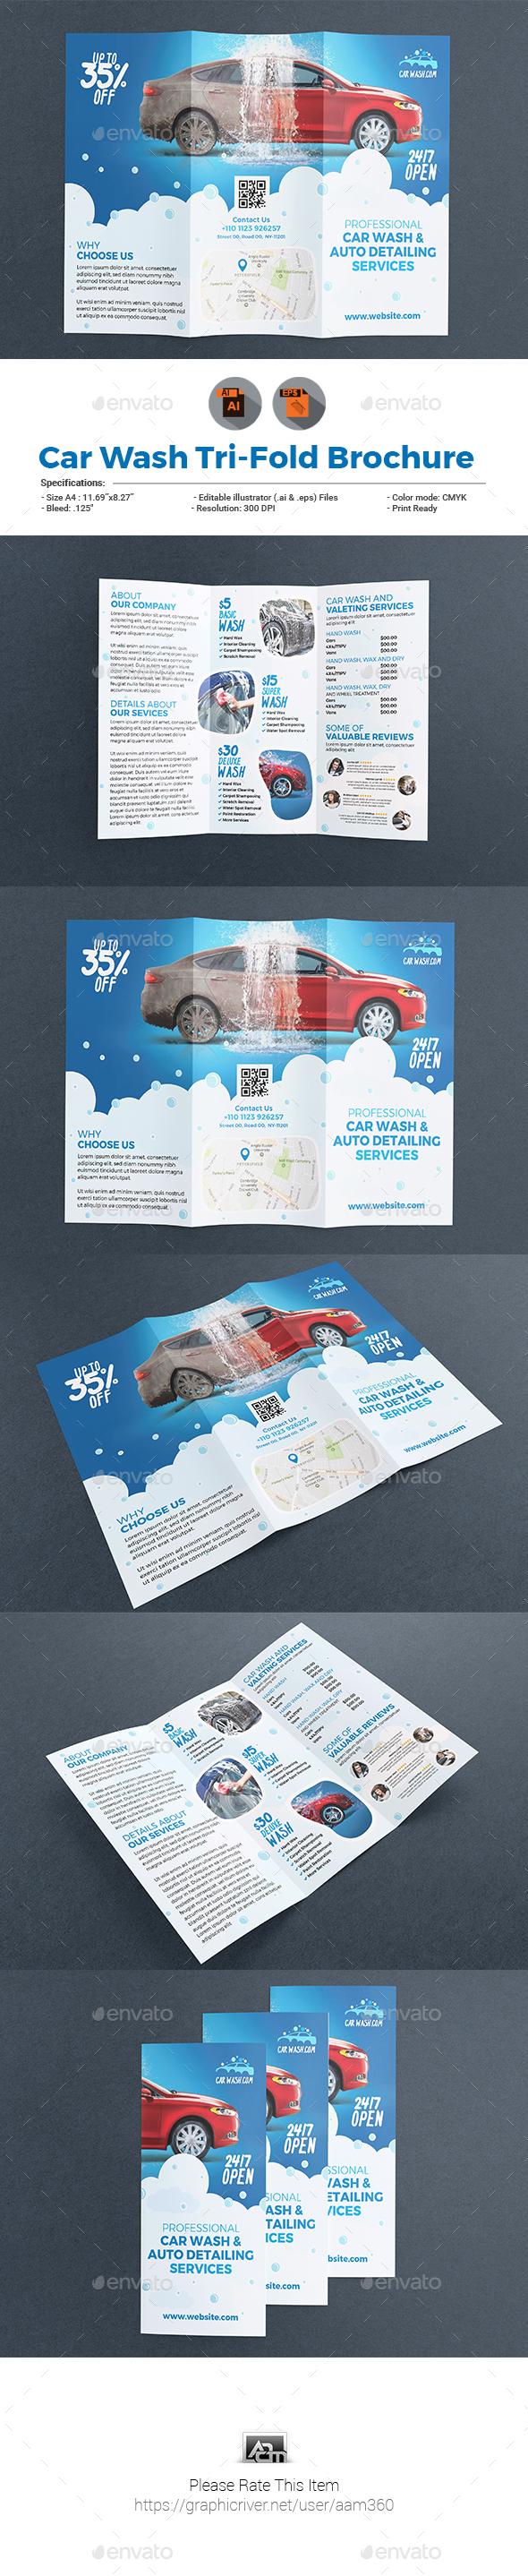 Car Wash Tri-fold Brochure Template - Brochures Print Templates